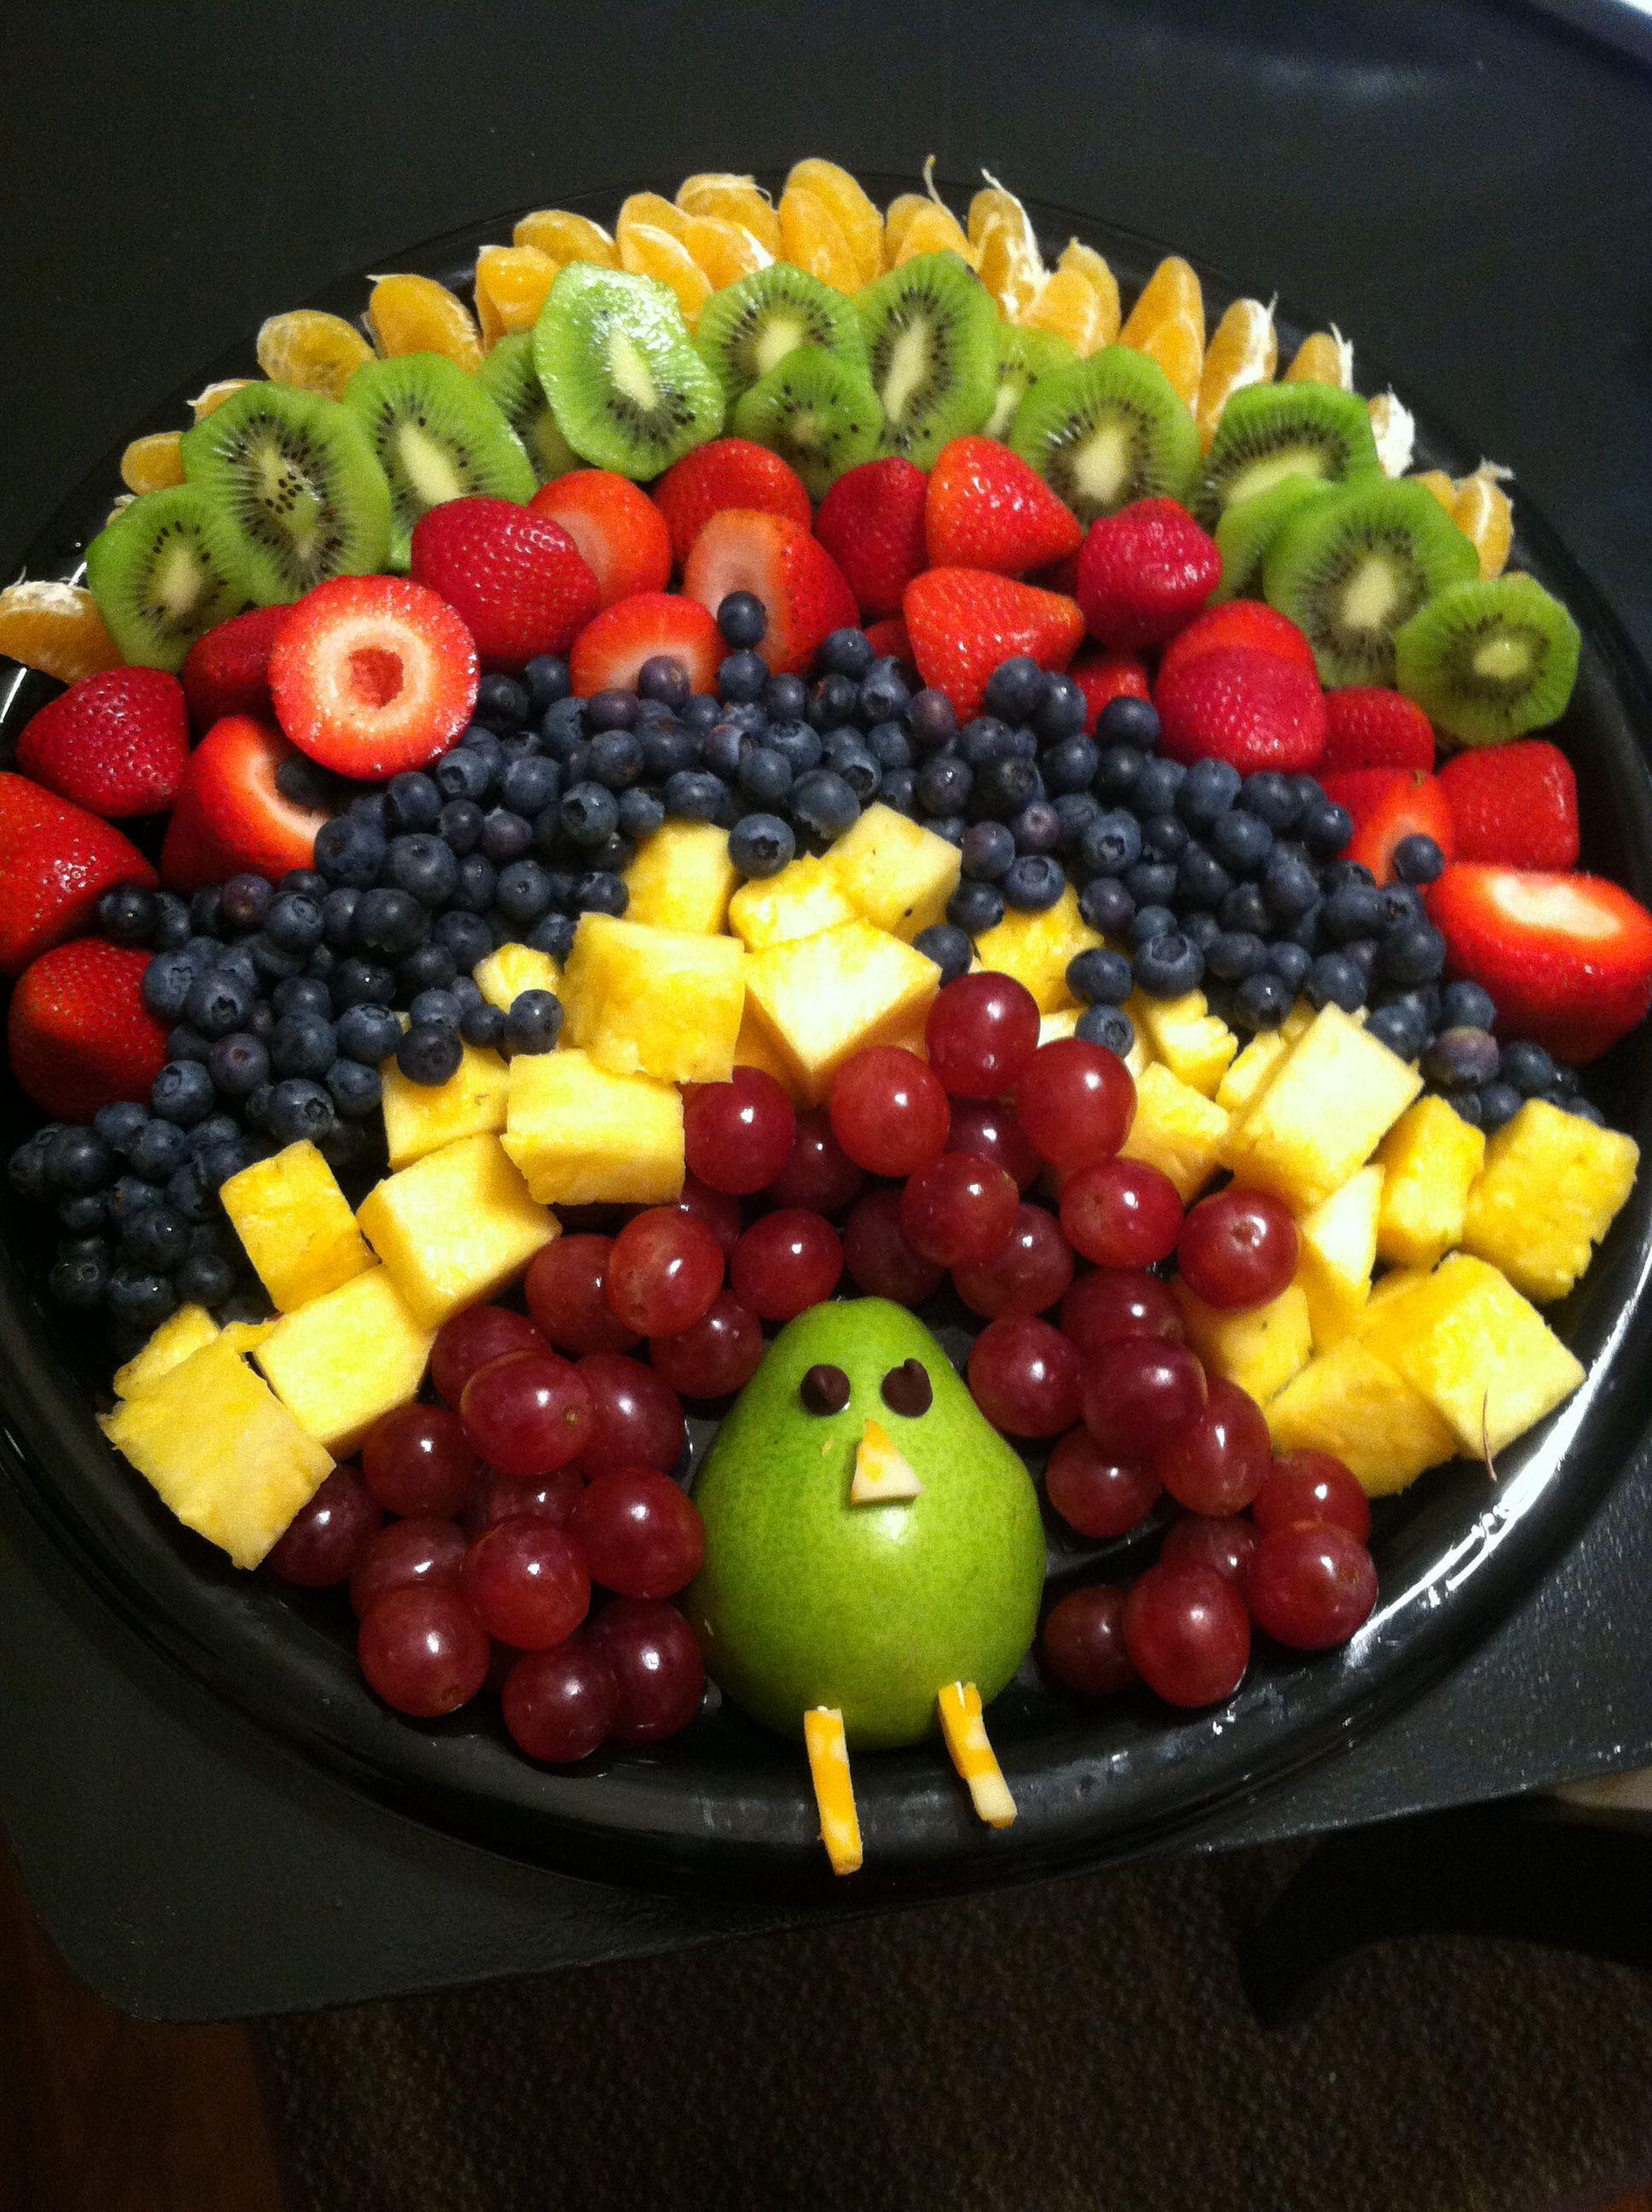 Shoprite Thanksgiving Dinner 2019  Fruit tray for thanksgiving morning